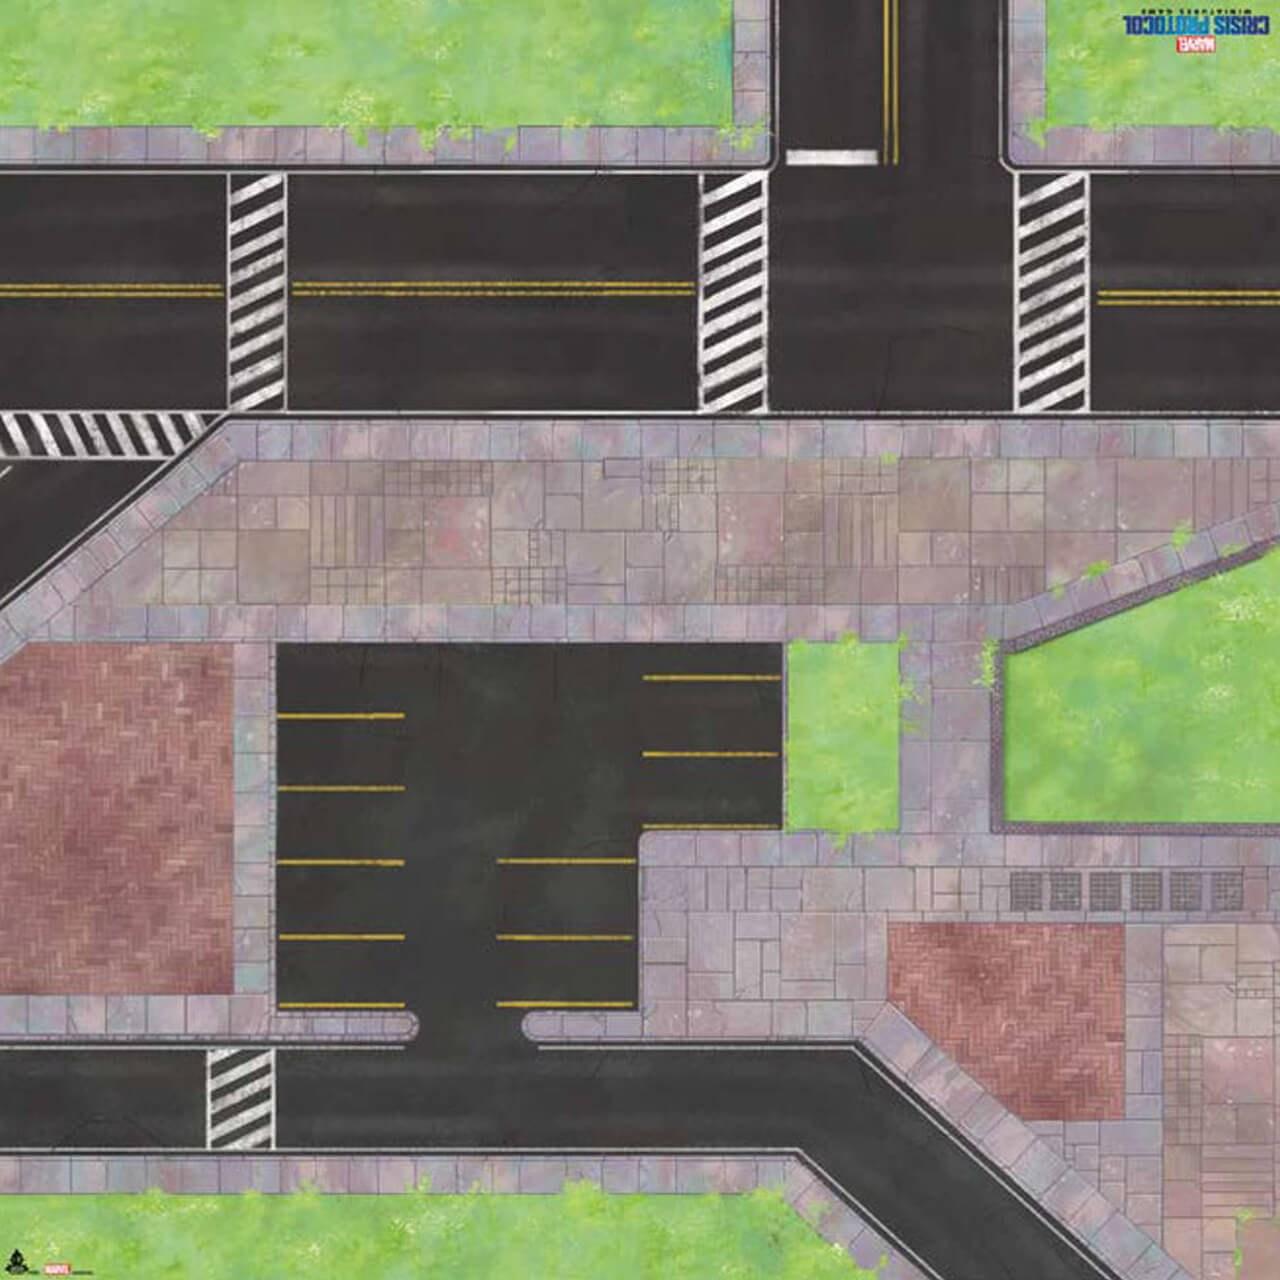 Marvel Crisis Protocol: Midtown Mayhem Game Mat